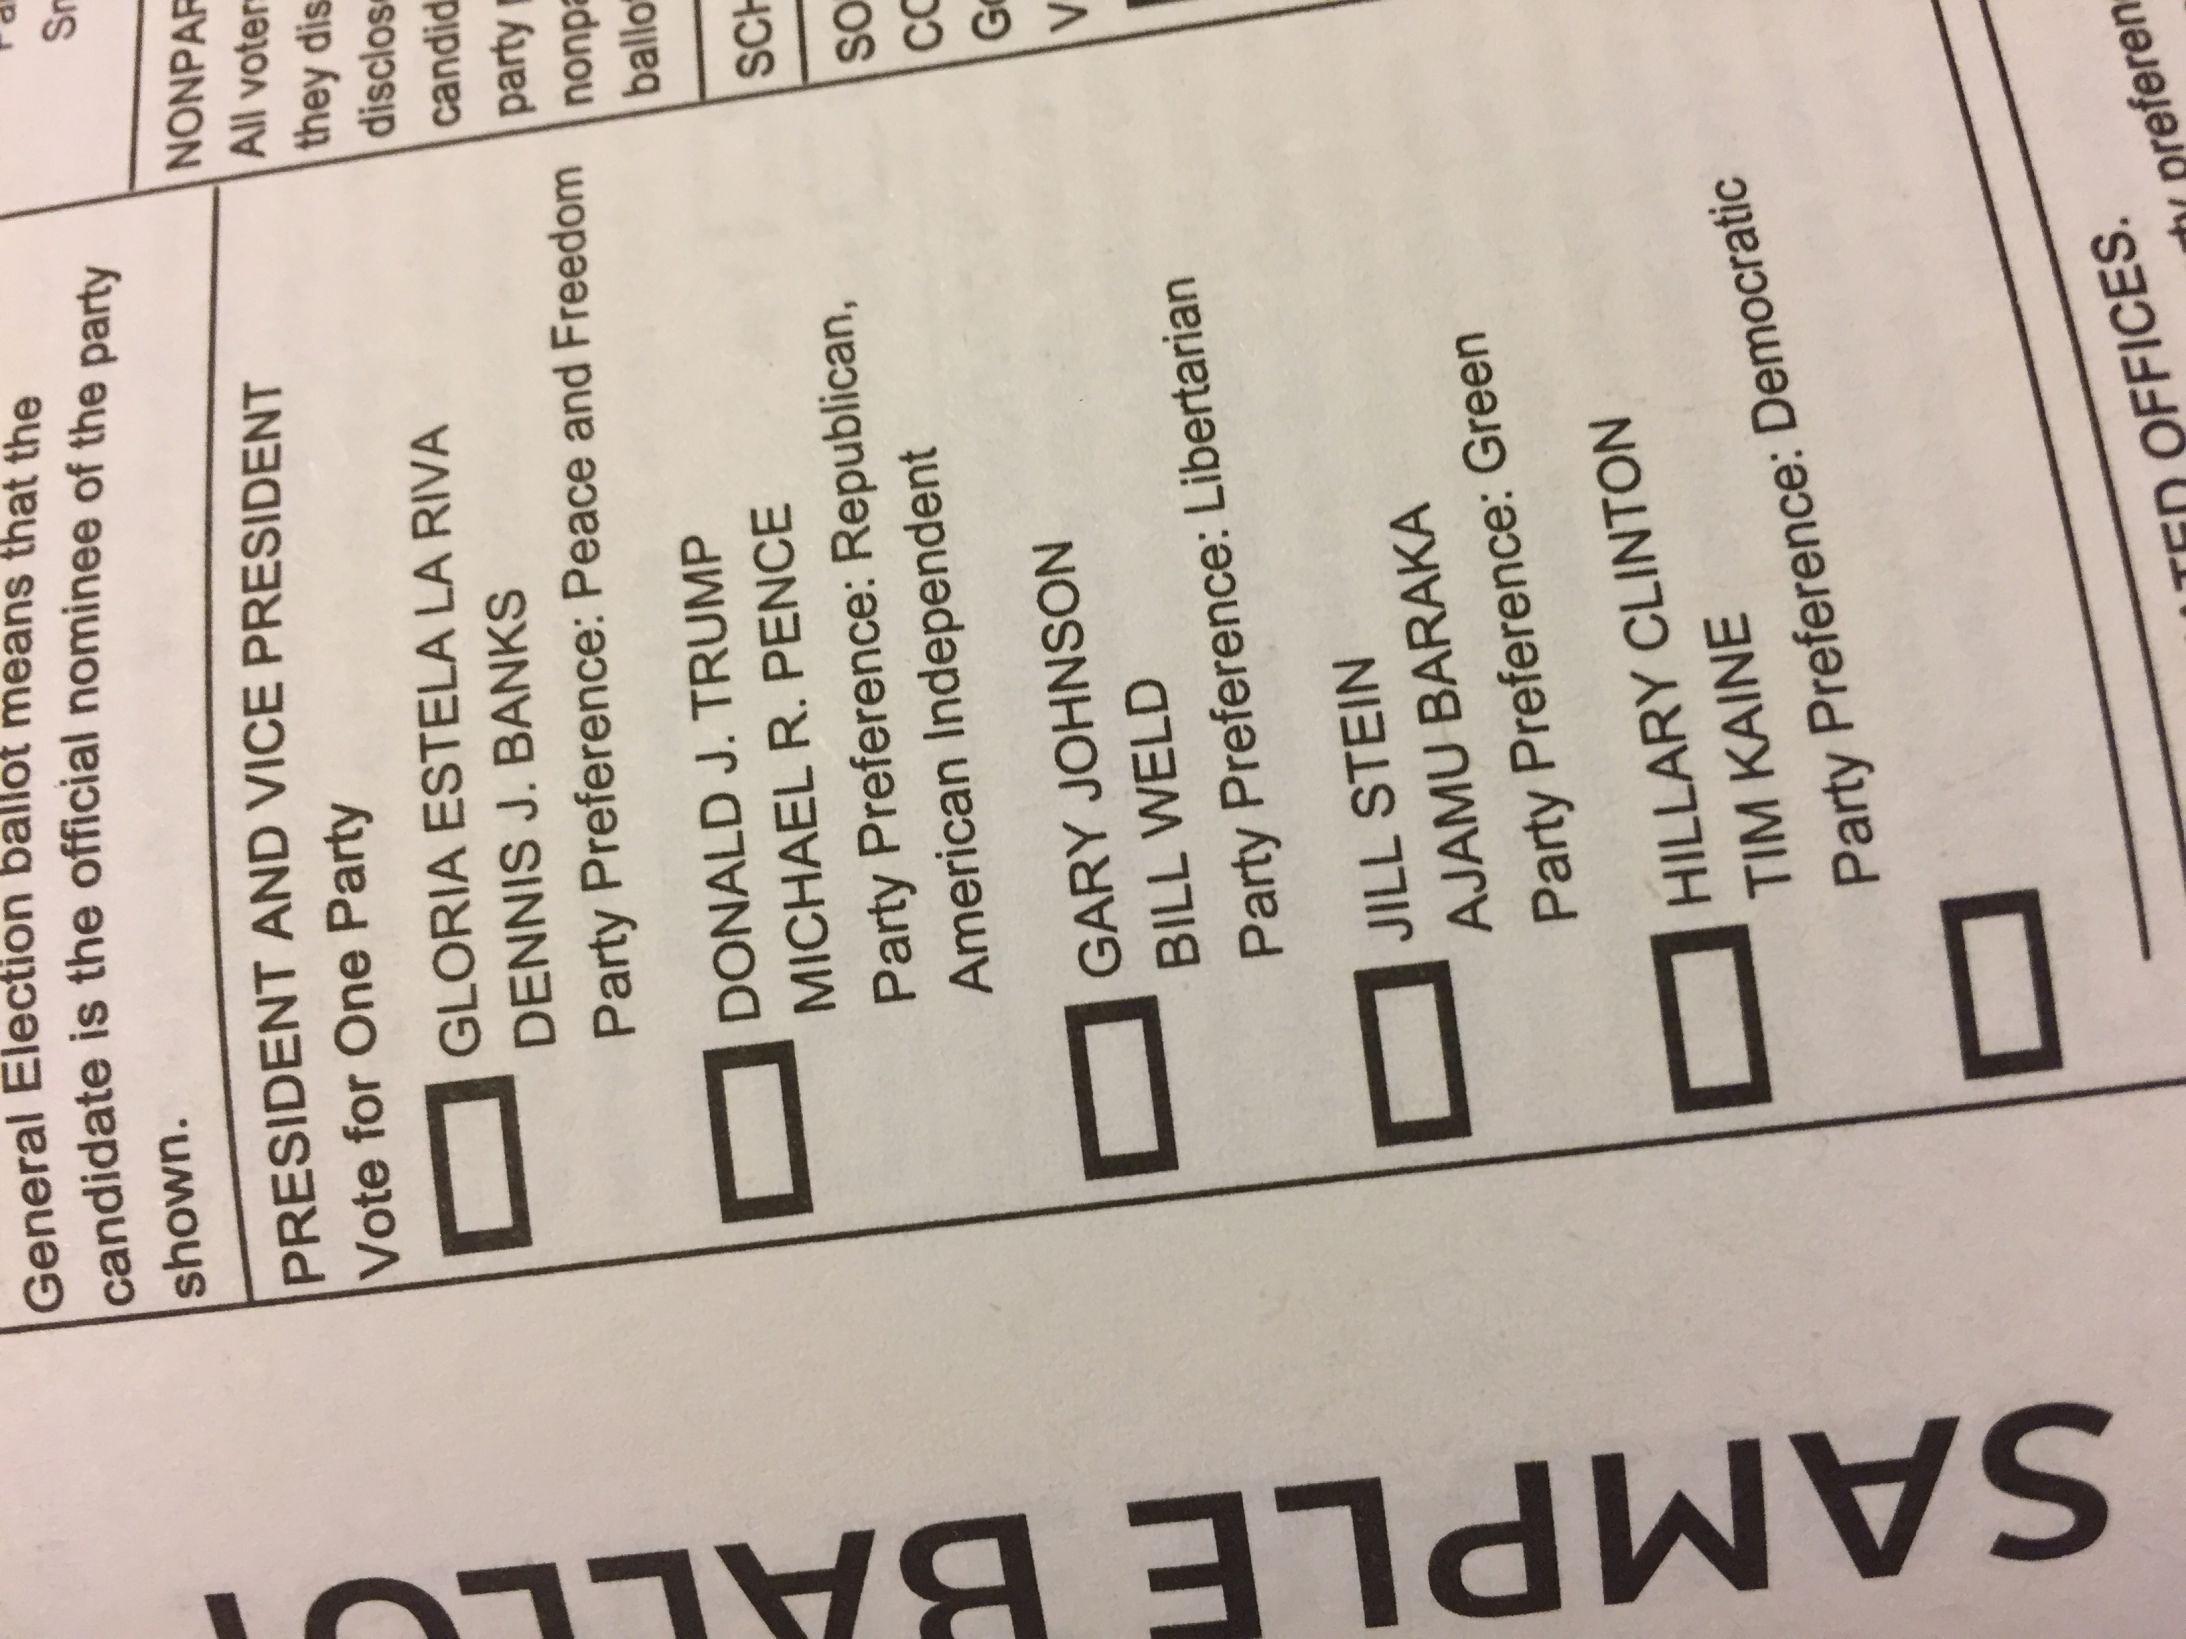 high quality sample ballot blank meme template